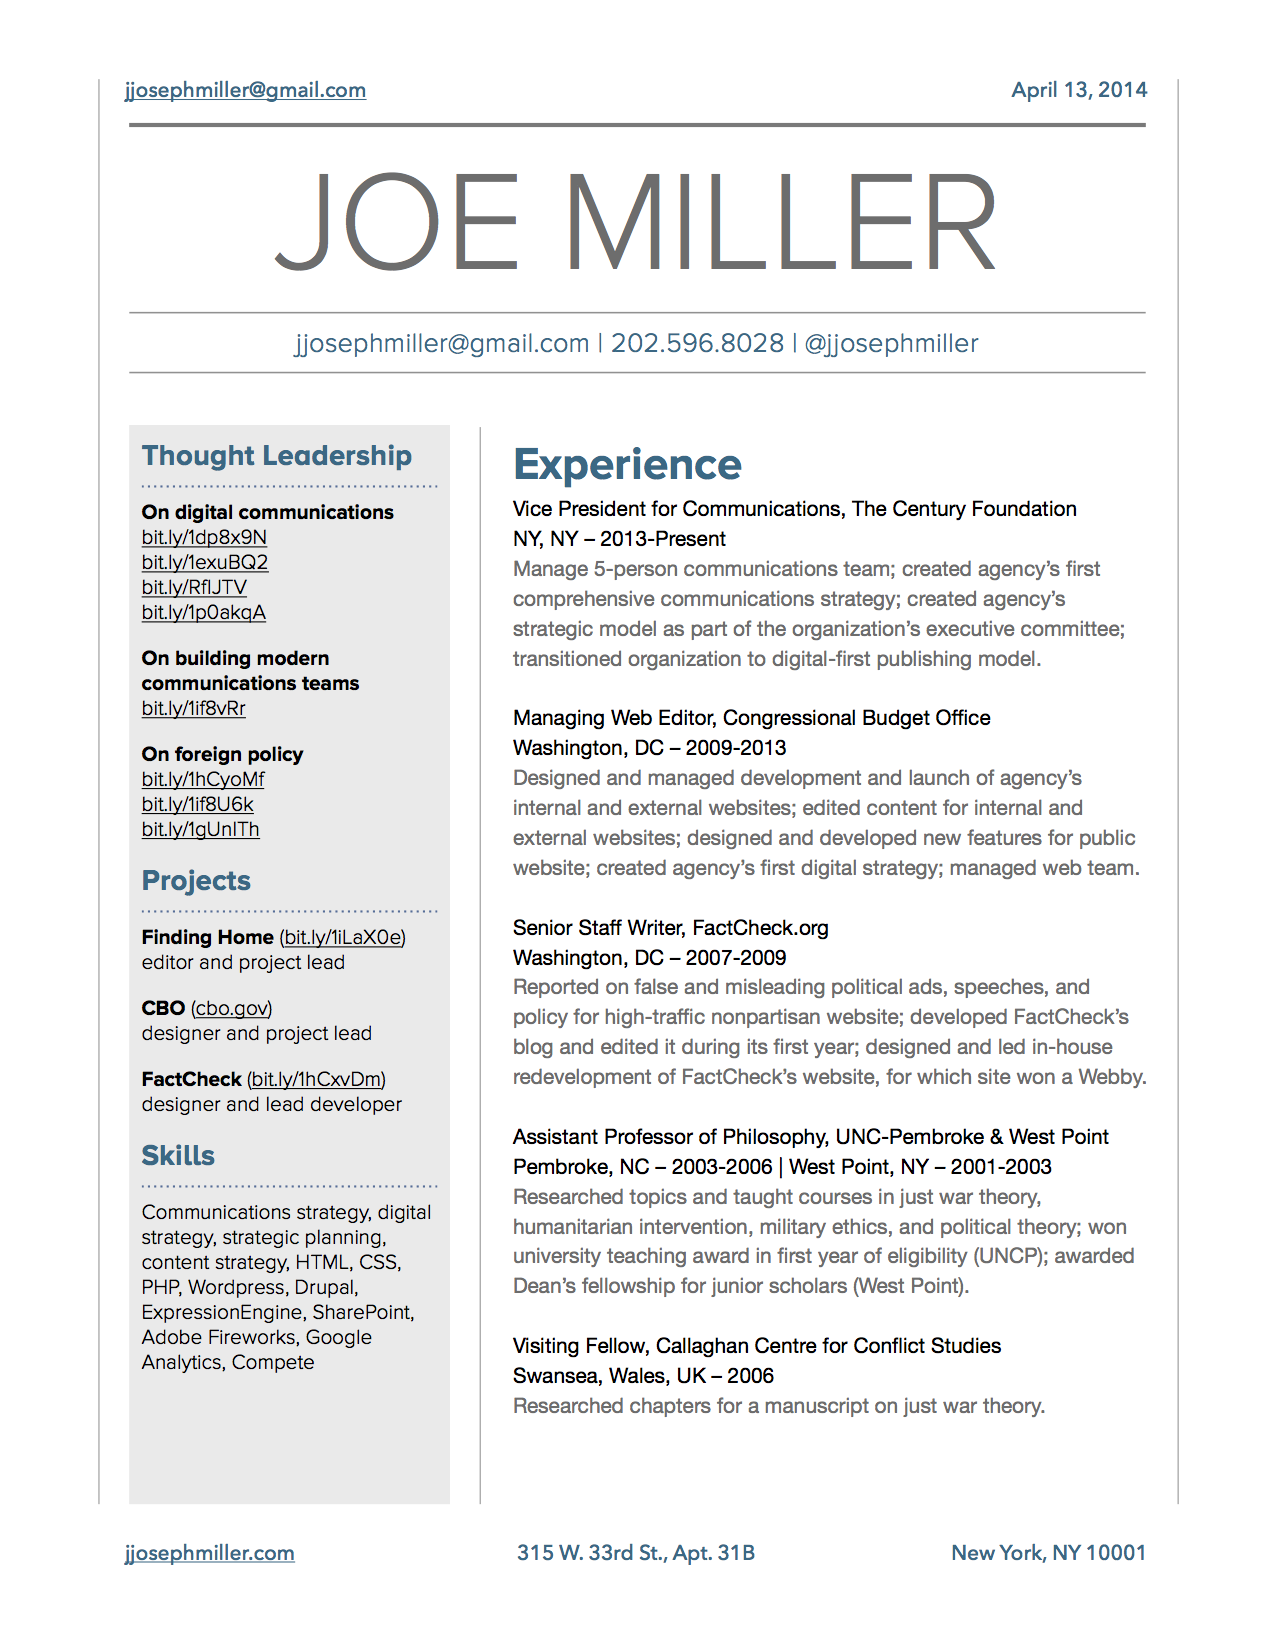 Joe Miller's Resume